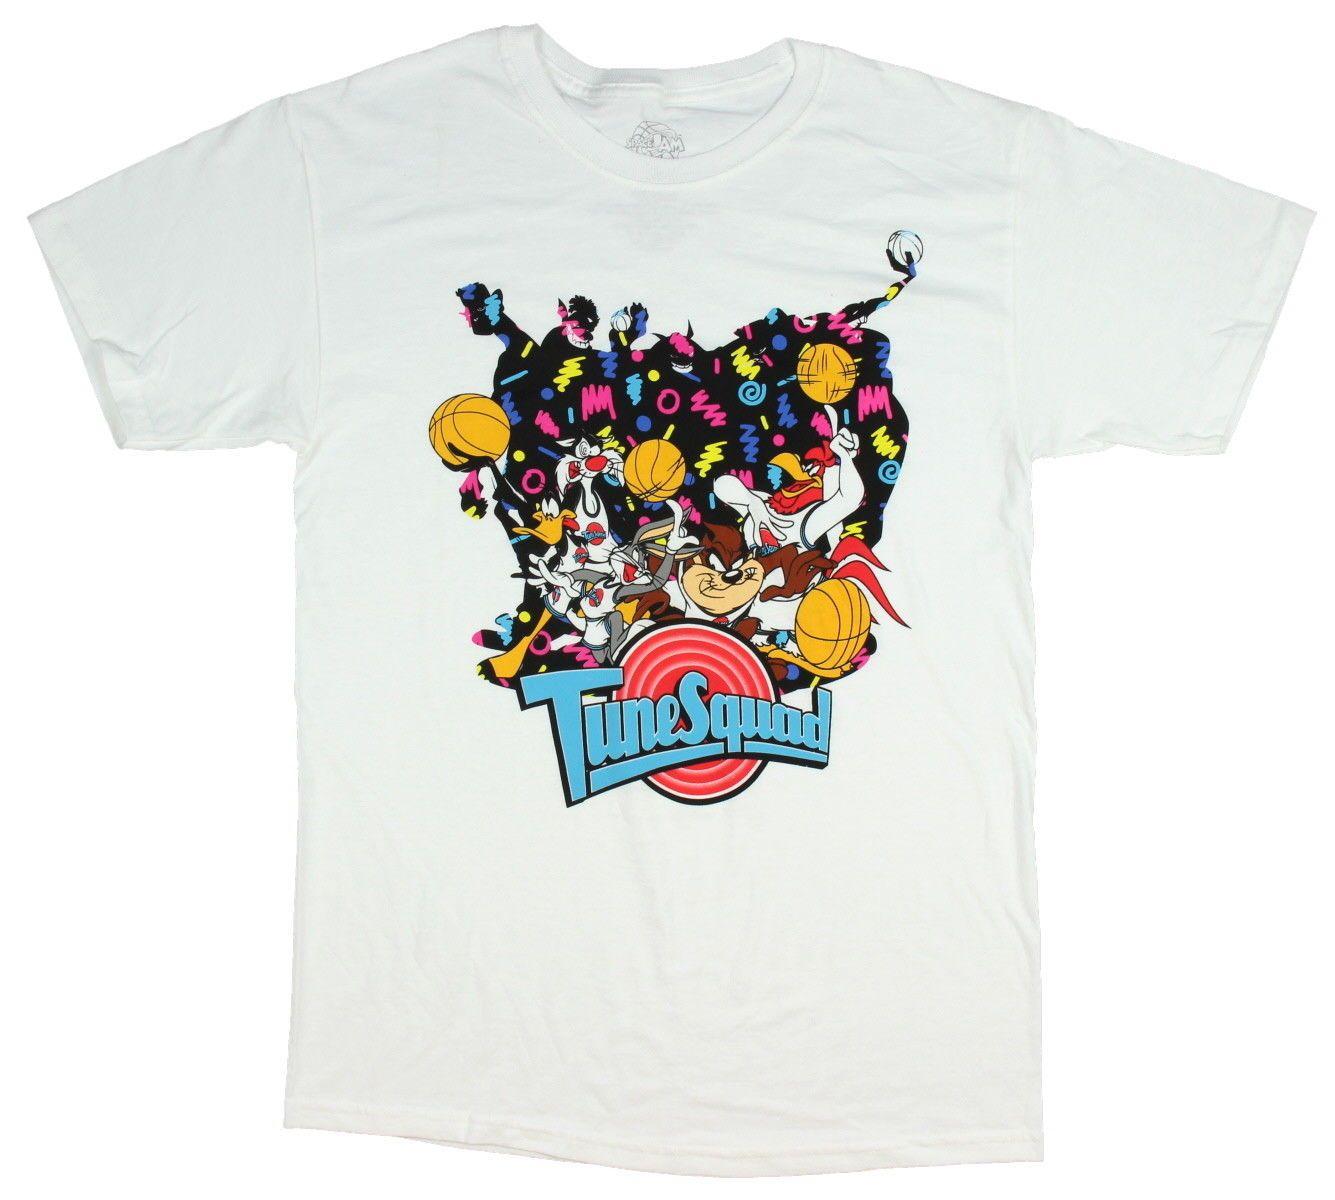 HombreMediana Jam Squad Tune Póster Camiseta Para Space Looney De Tunes OuliwPXTkZ